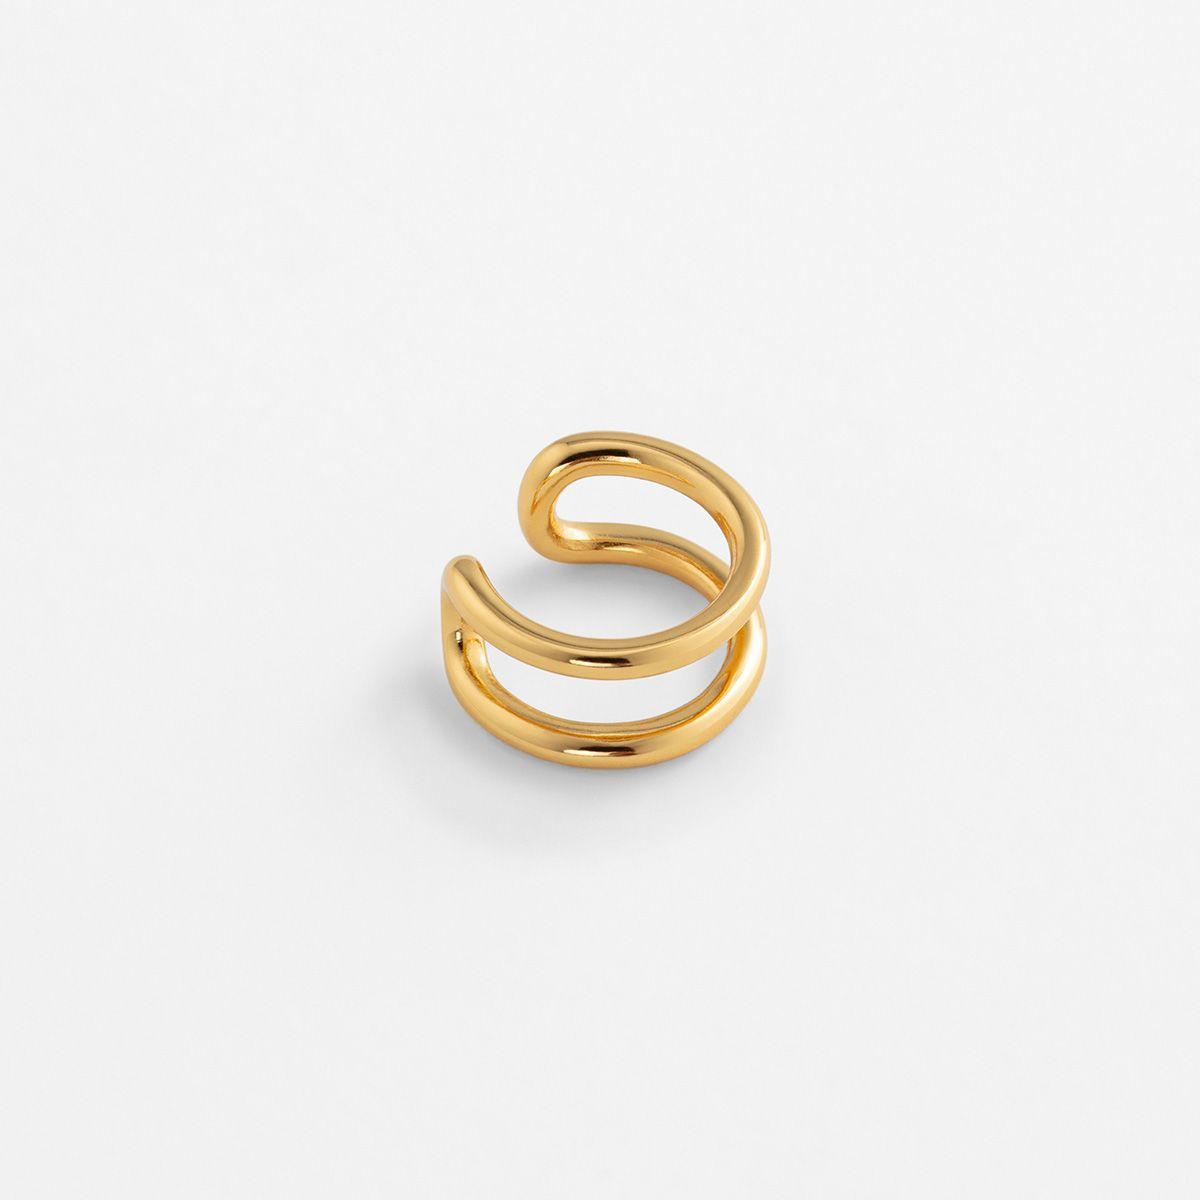 Lina - Earcuffs - 18k vergoldet